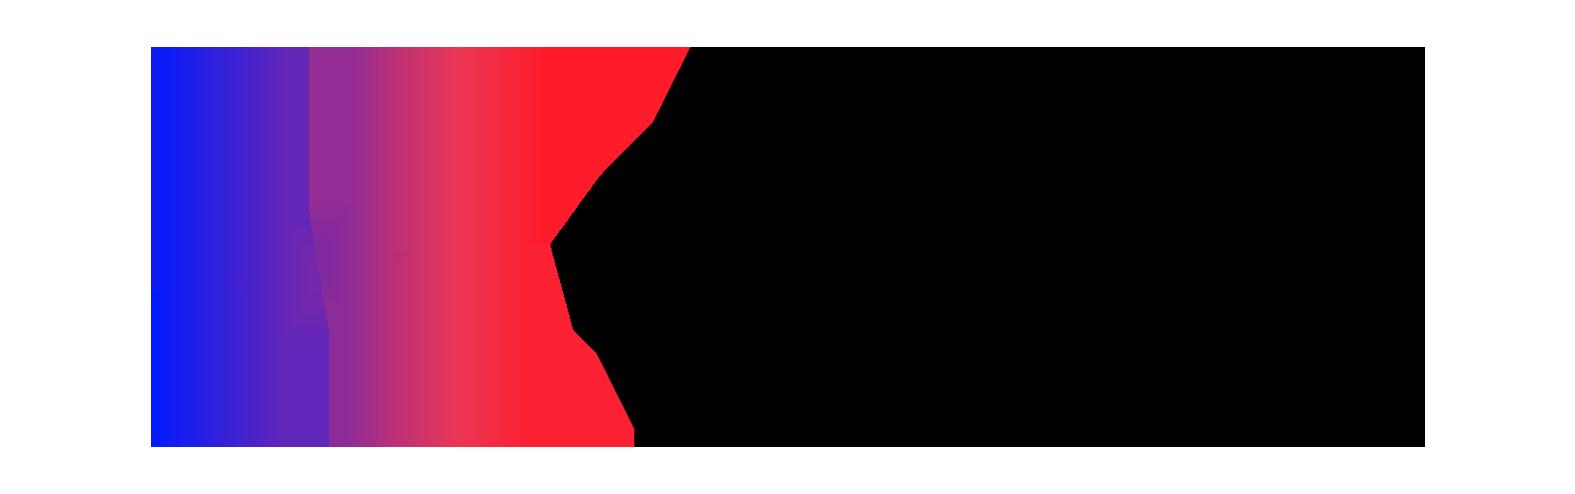 aaptiv-logo@5x.png